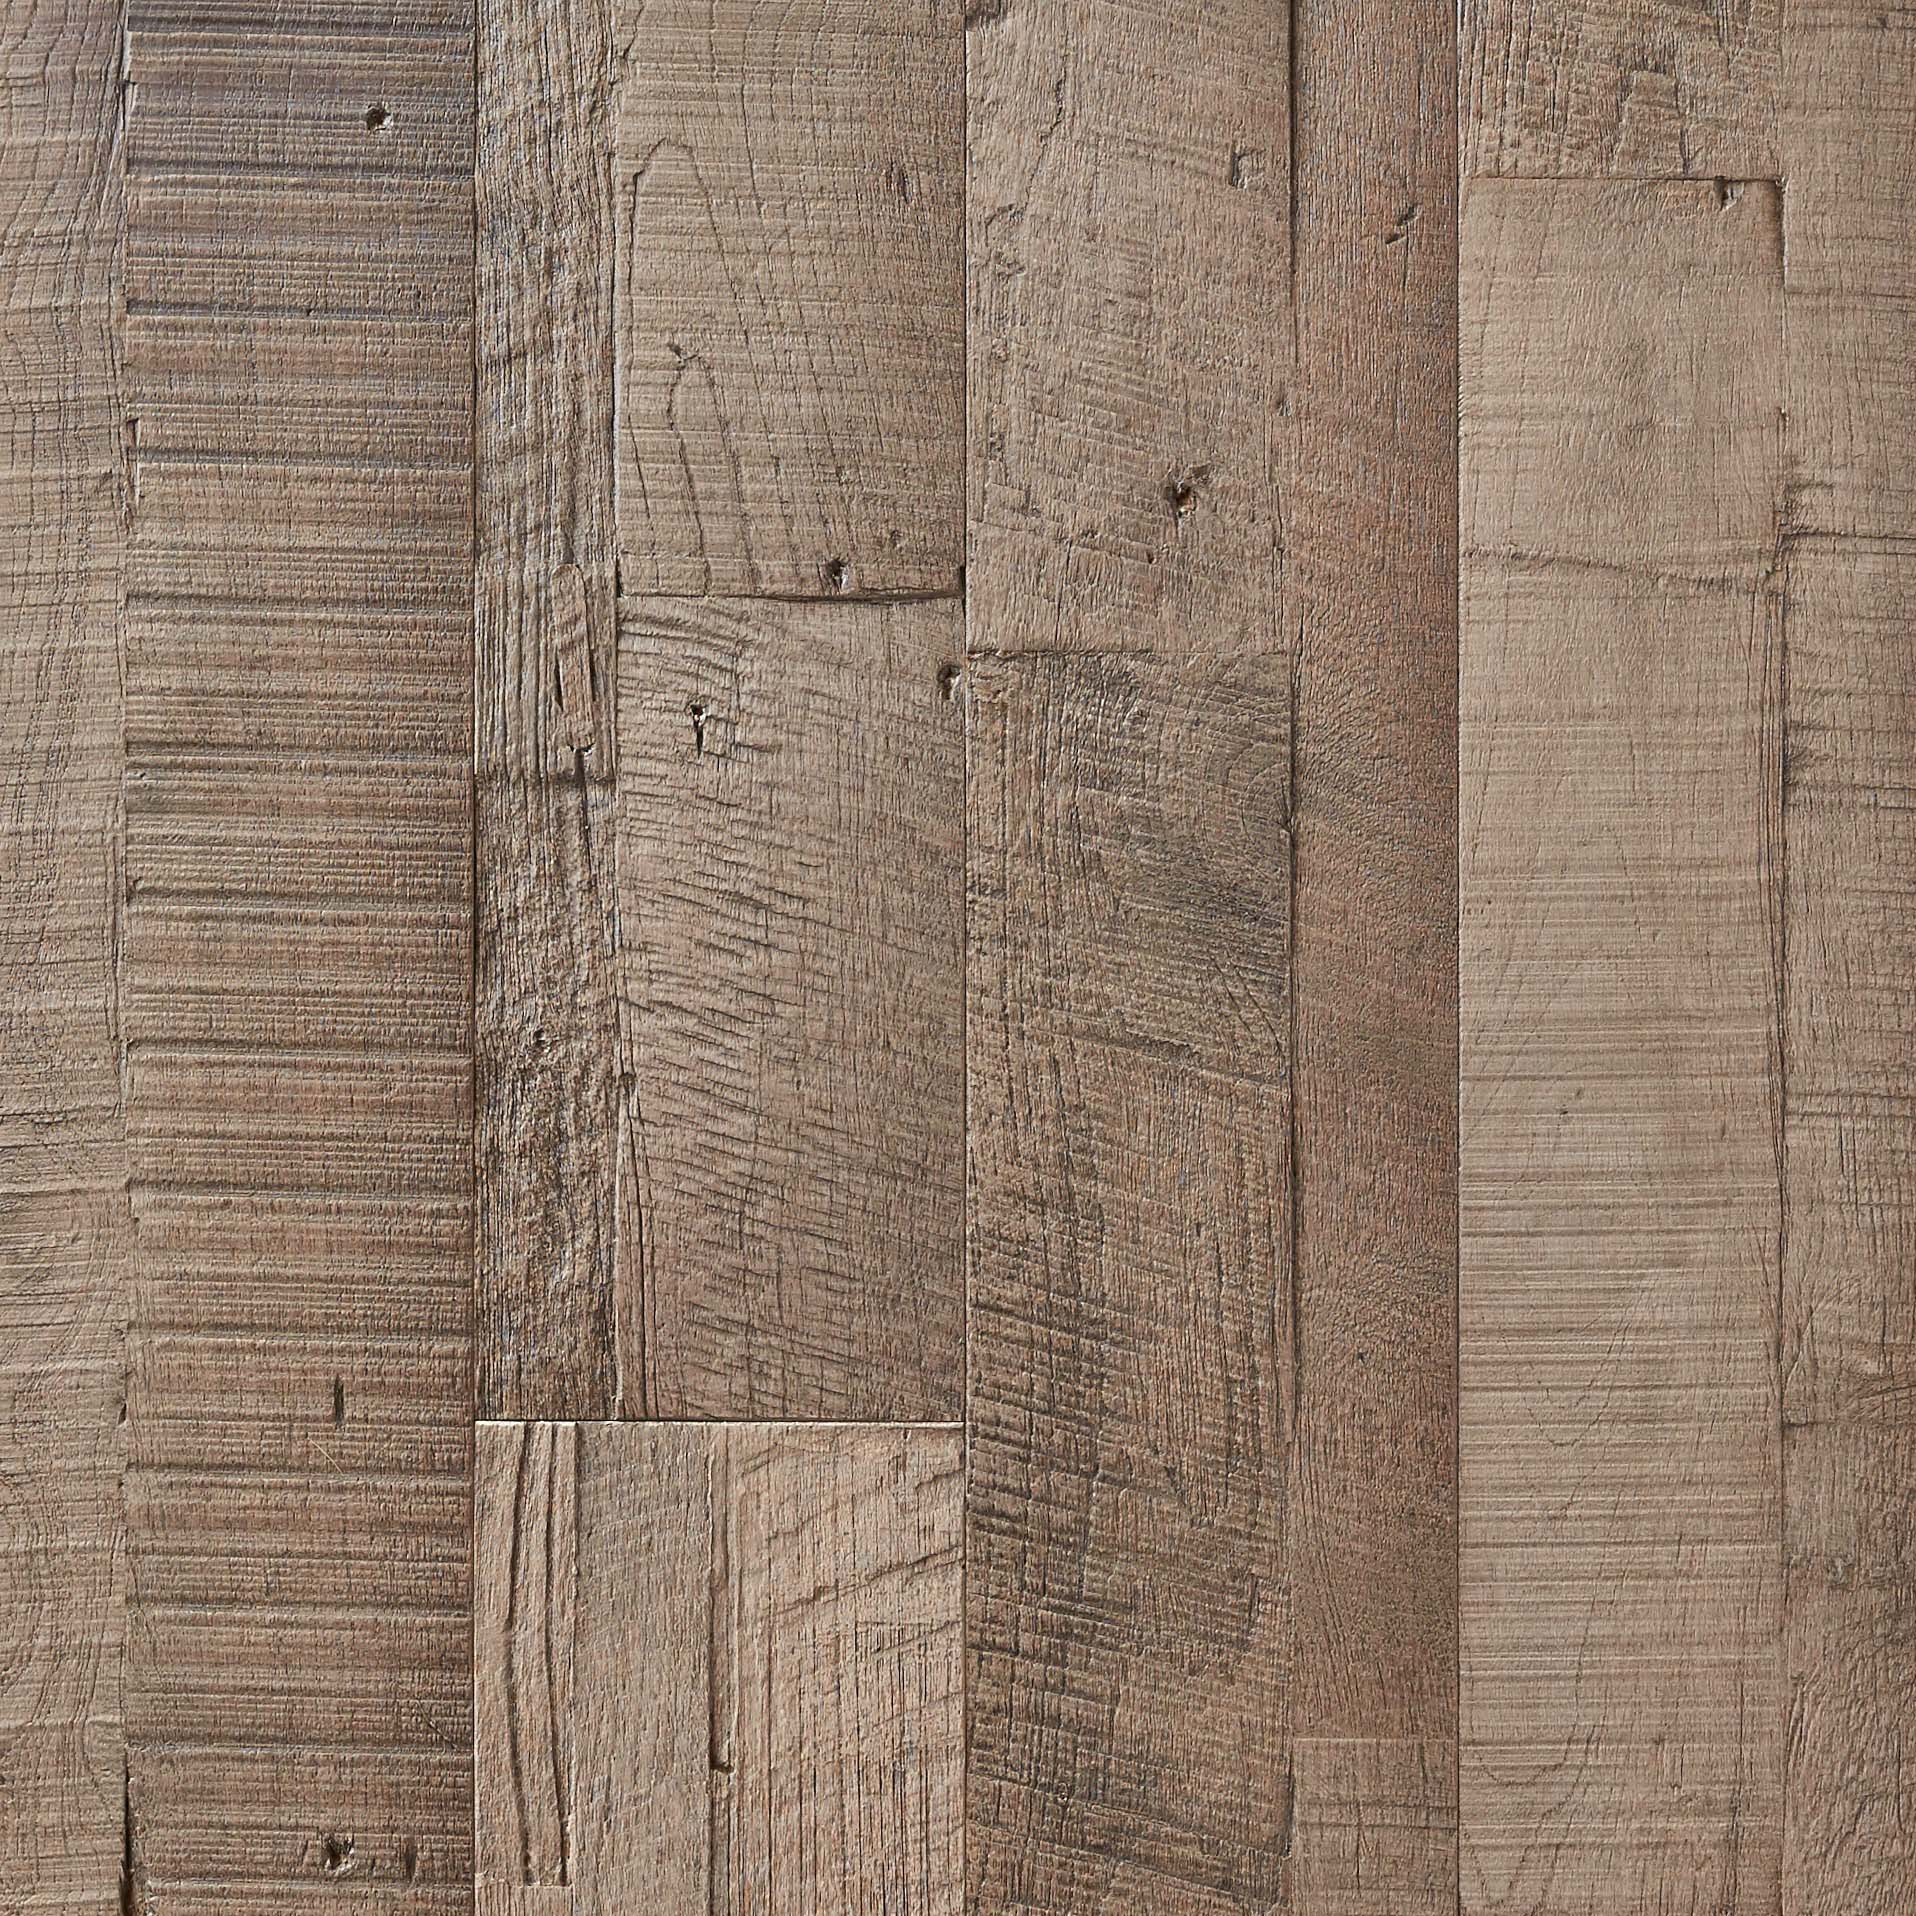 multistrip patina ash - Reclaimed Teak Flooring